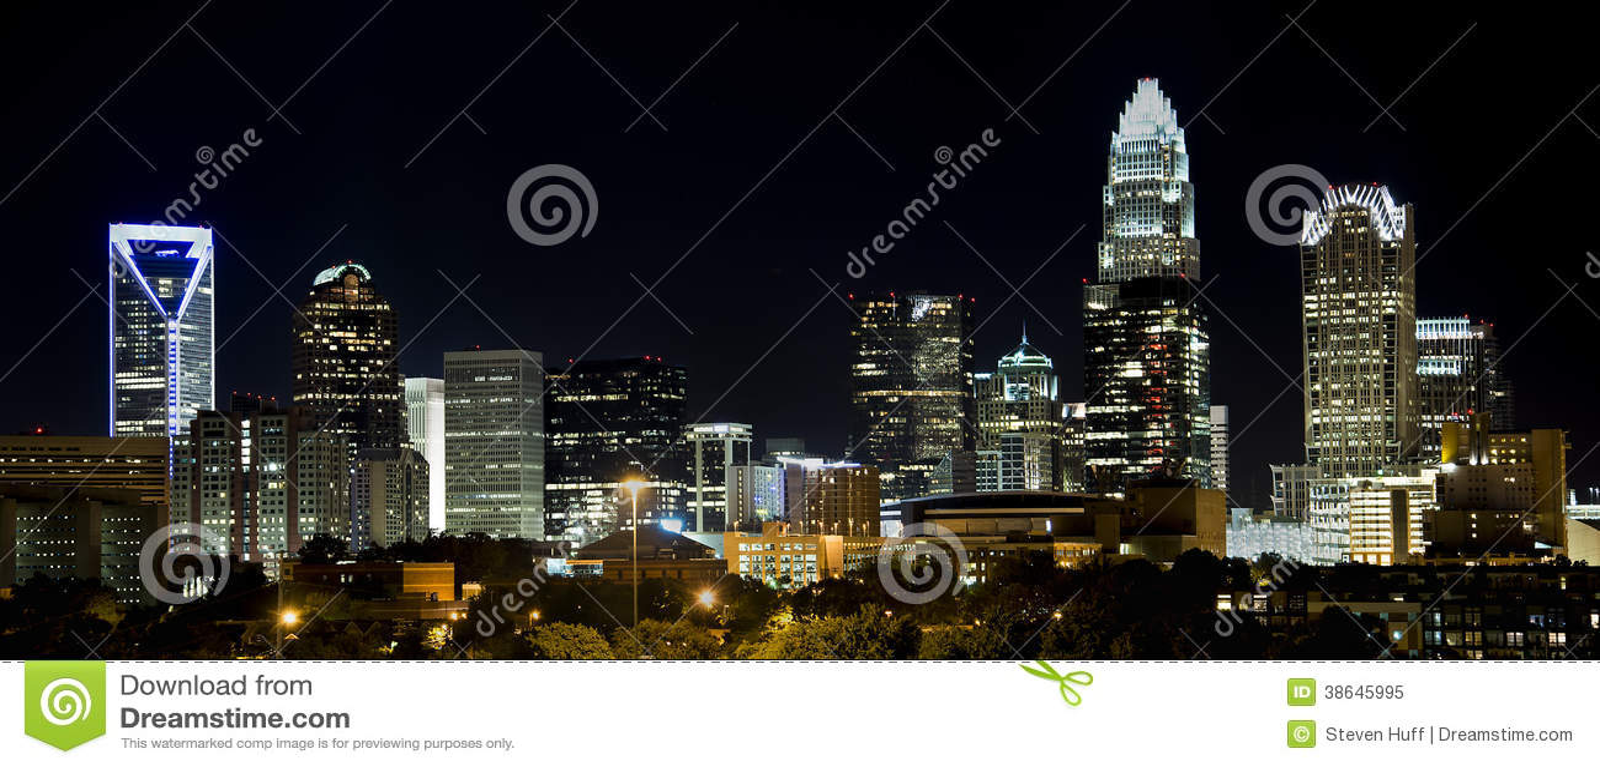 Charlotte Skyline at Night